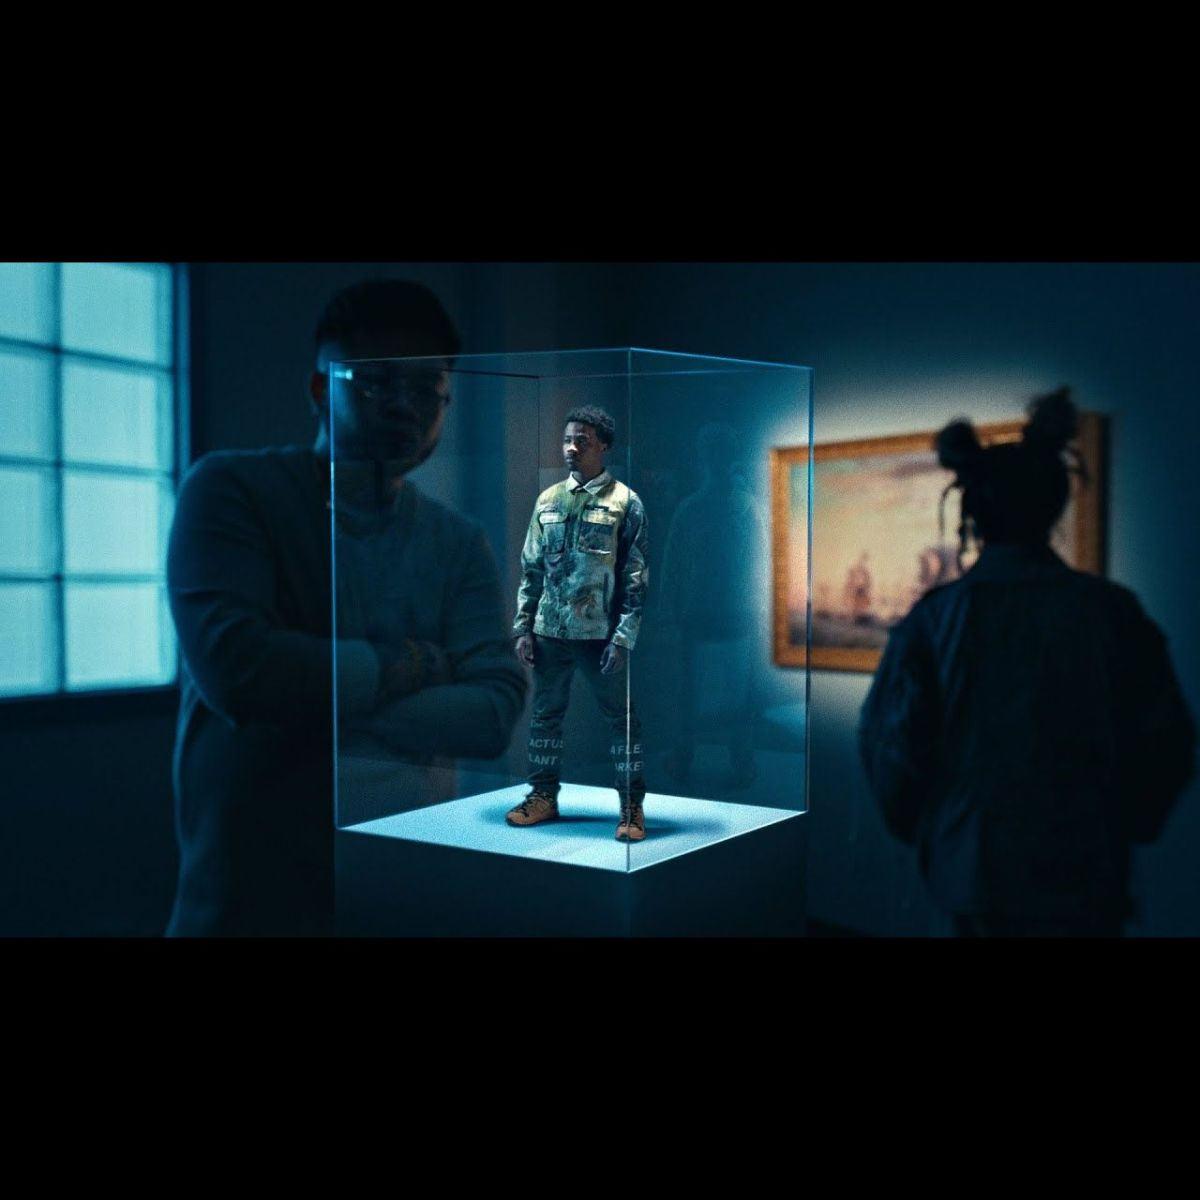 Roddy Ricch - The Box (Thumbnail)